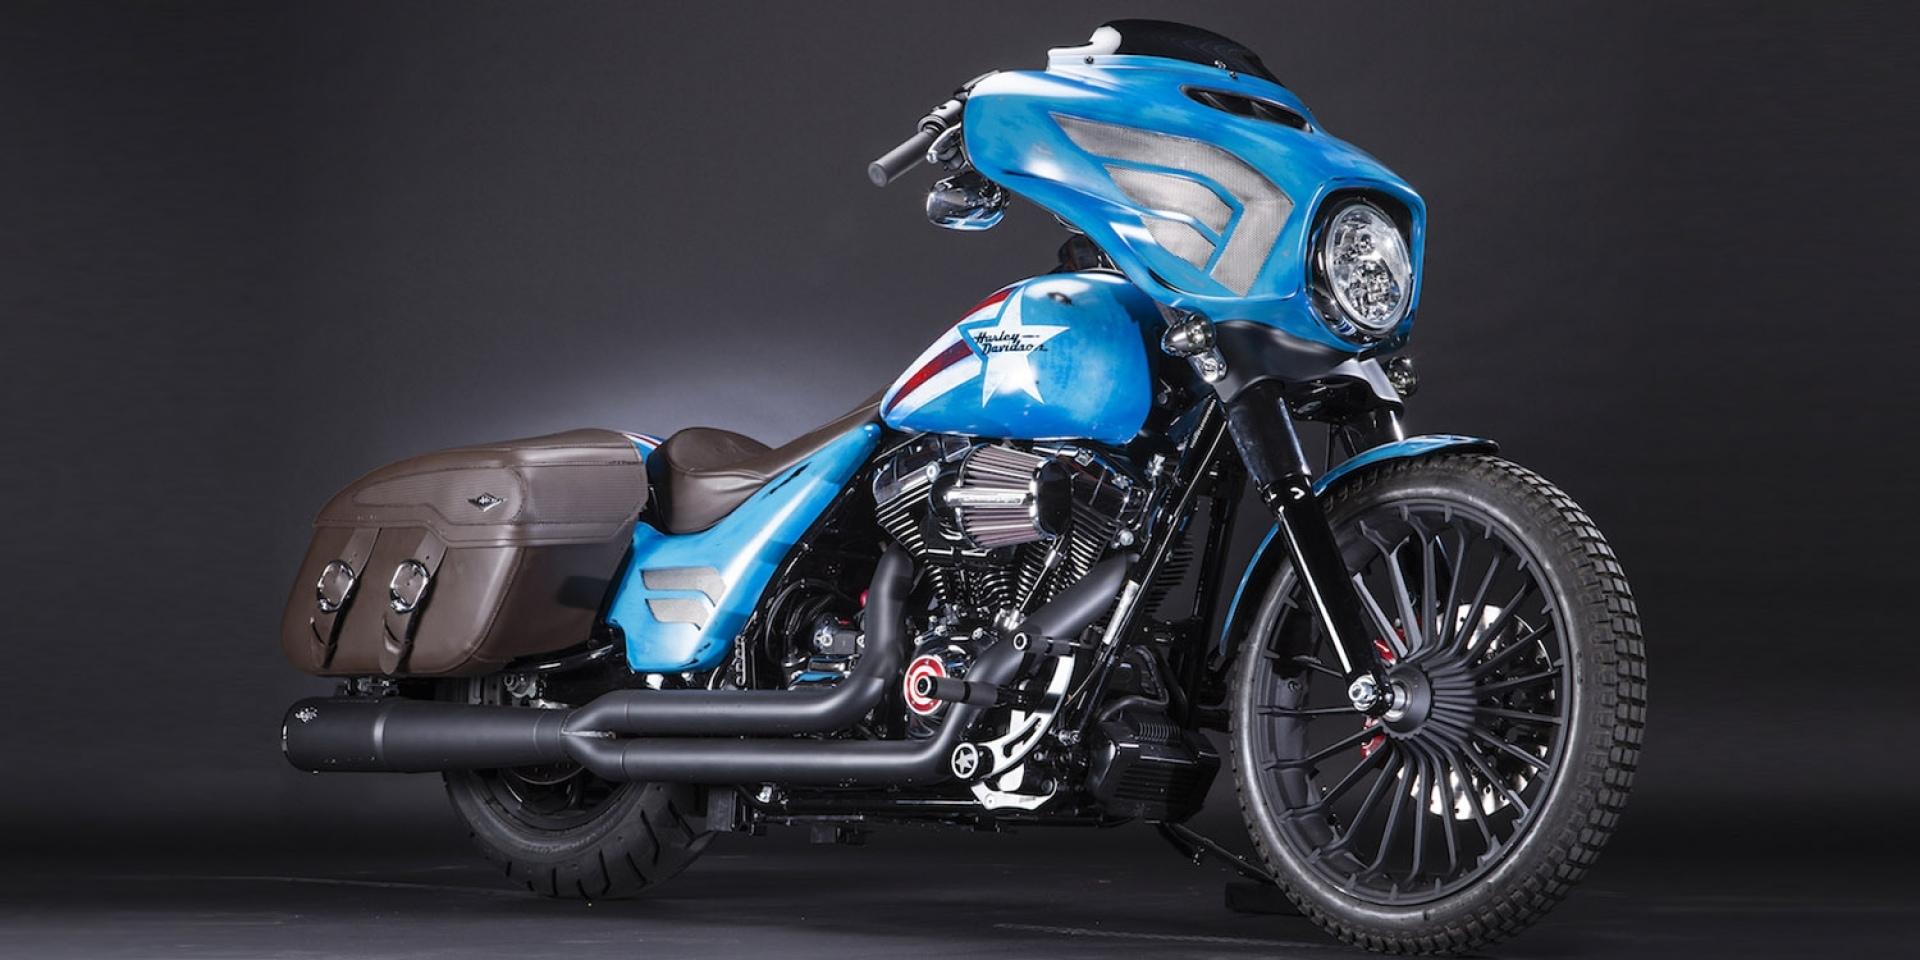 Harley Davidson X Marvel聯名 超級英雄手工車